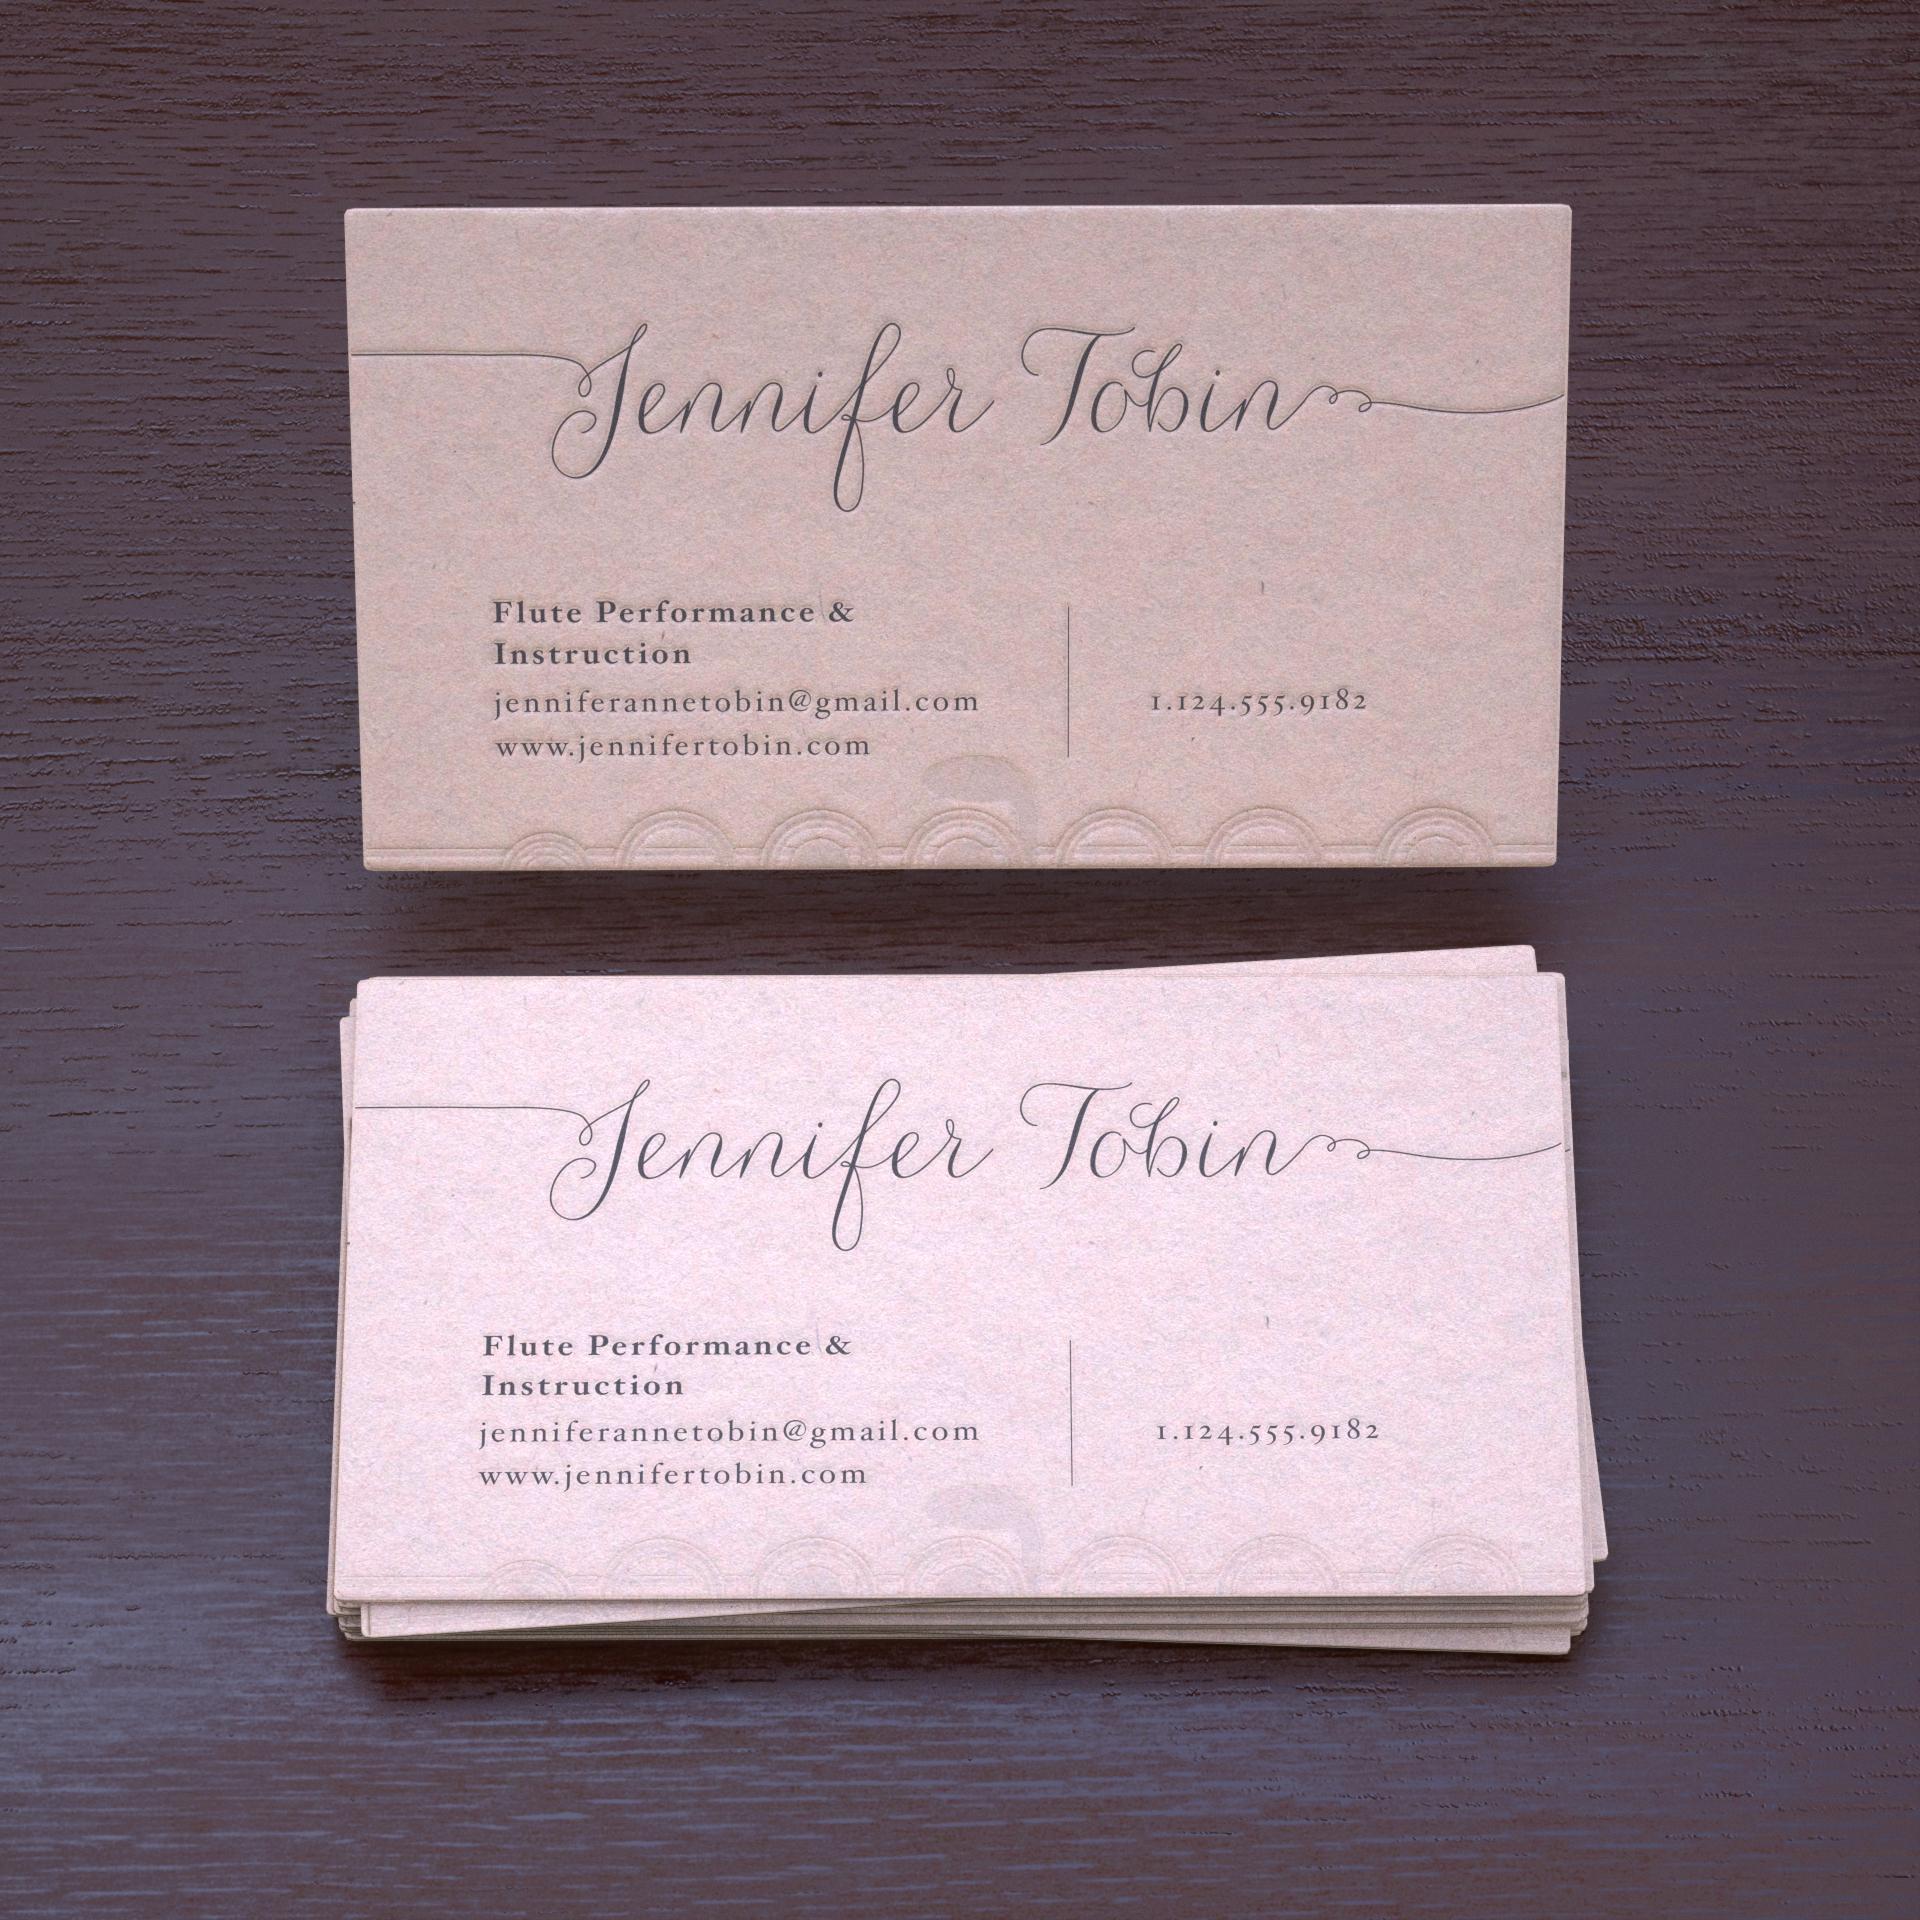 Jennifer Tobin Flute Performance & Instruction – Golden Fox Studio